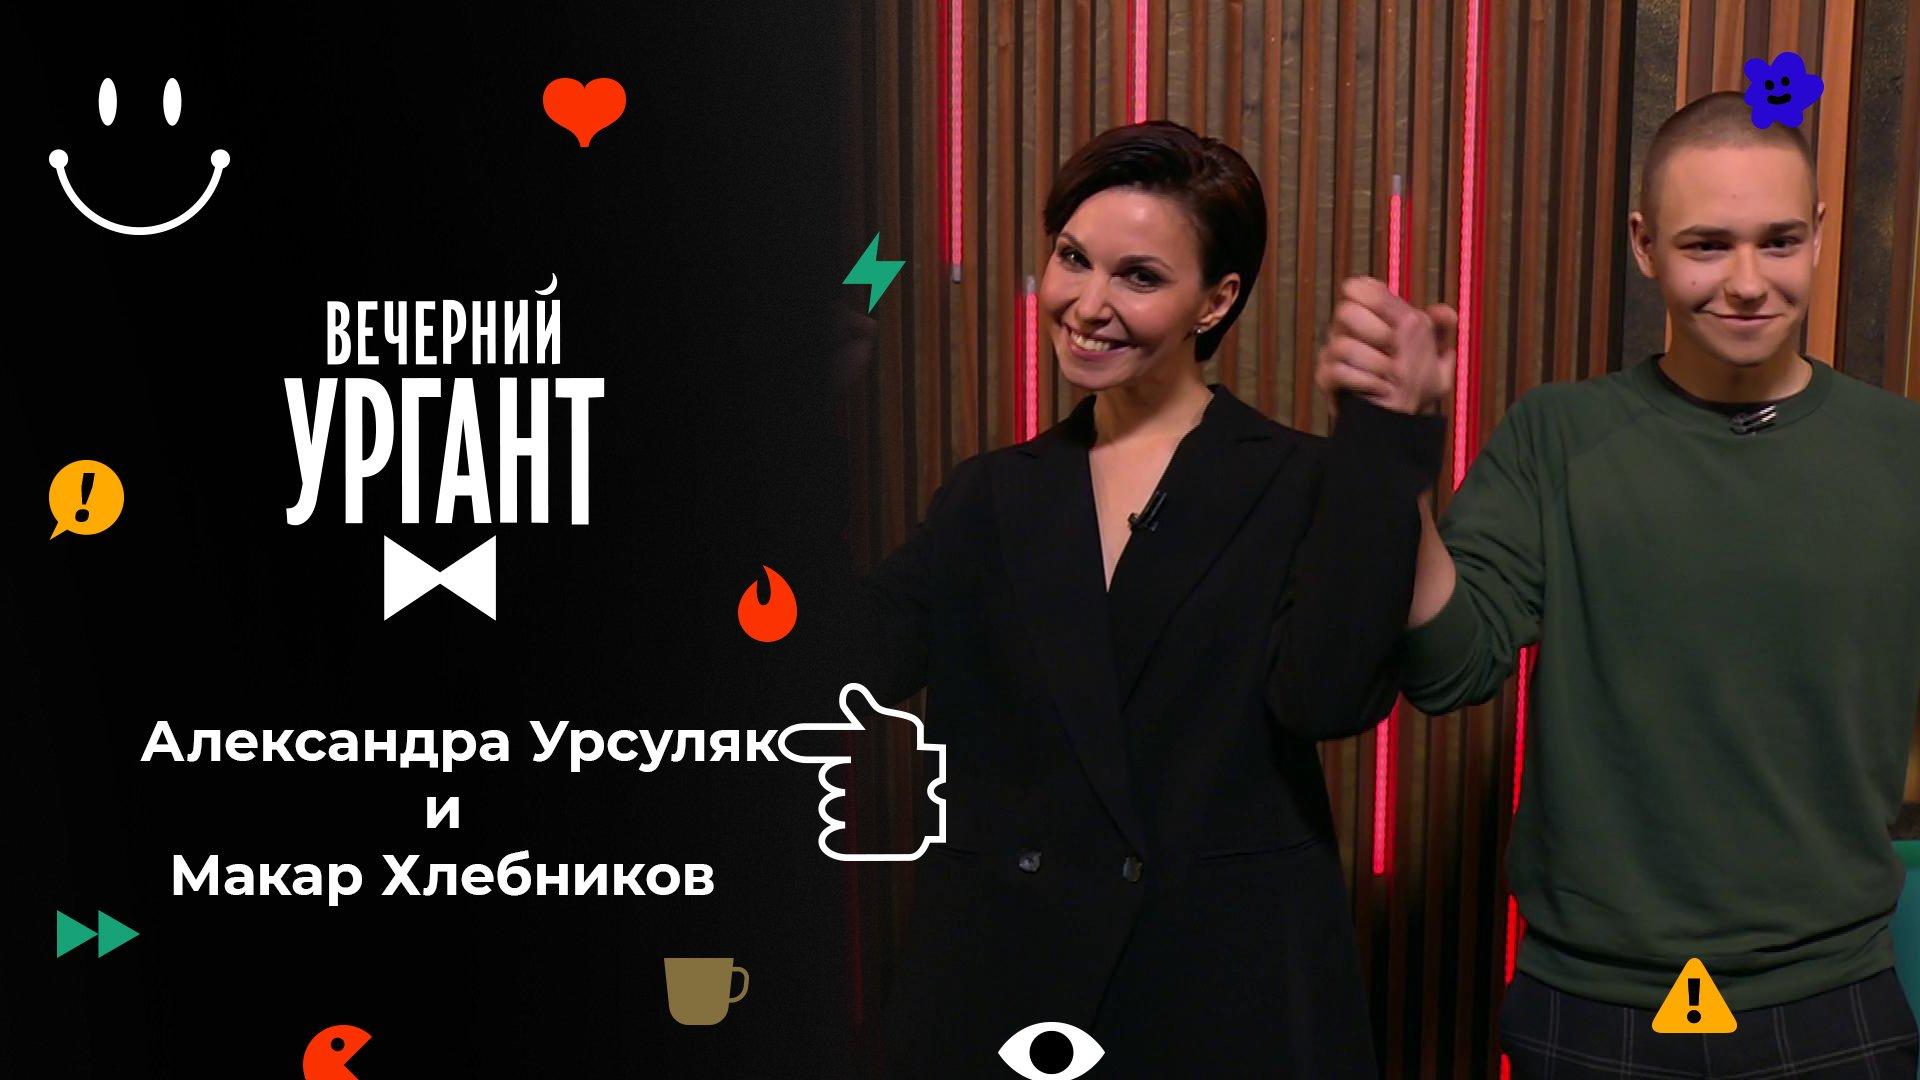 «Вечерний Ургант». Александра Урсуляк иМакар Хлебников